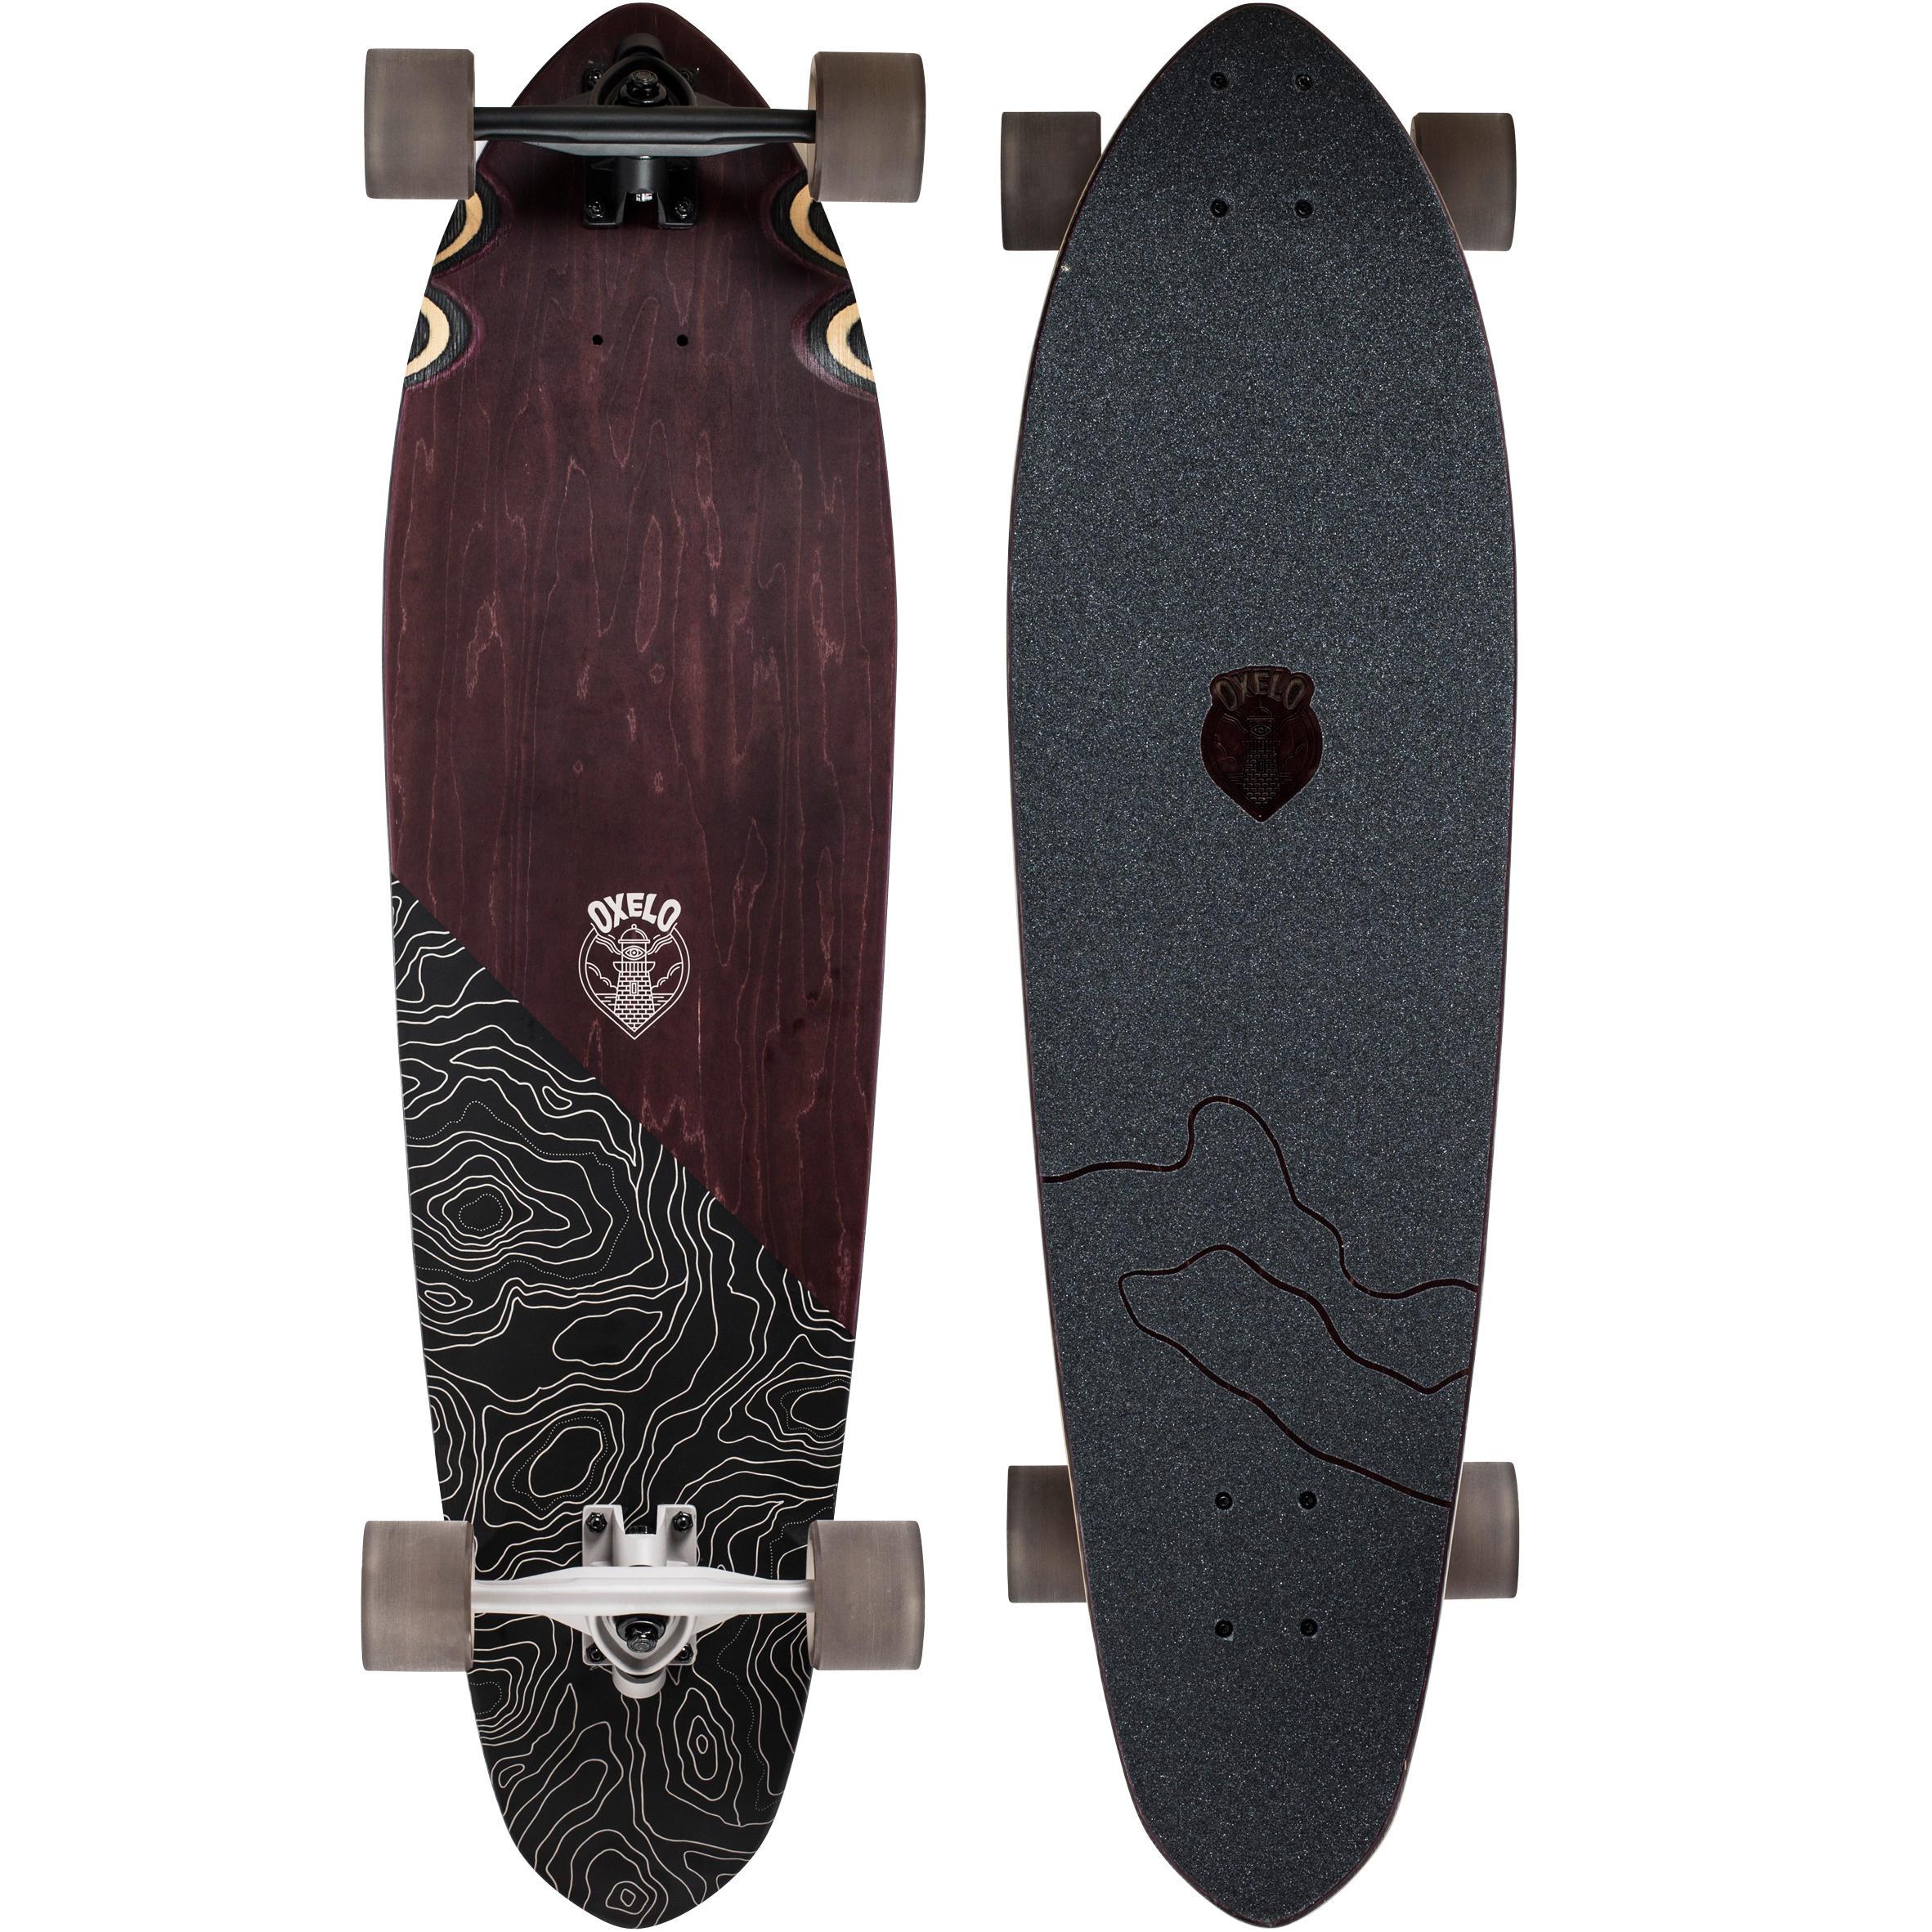 Classic Topo Longboard - Brown